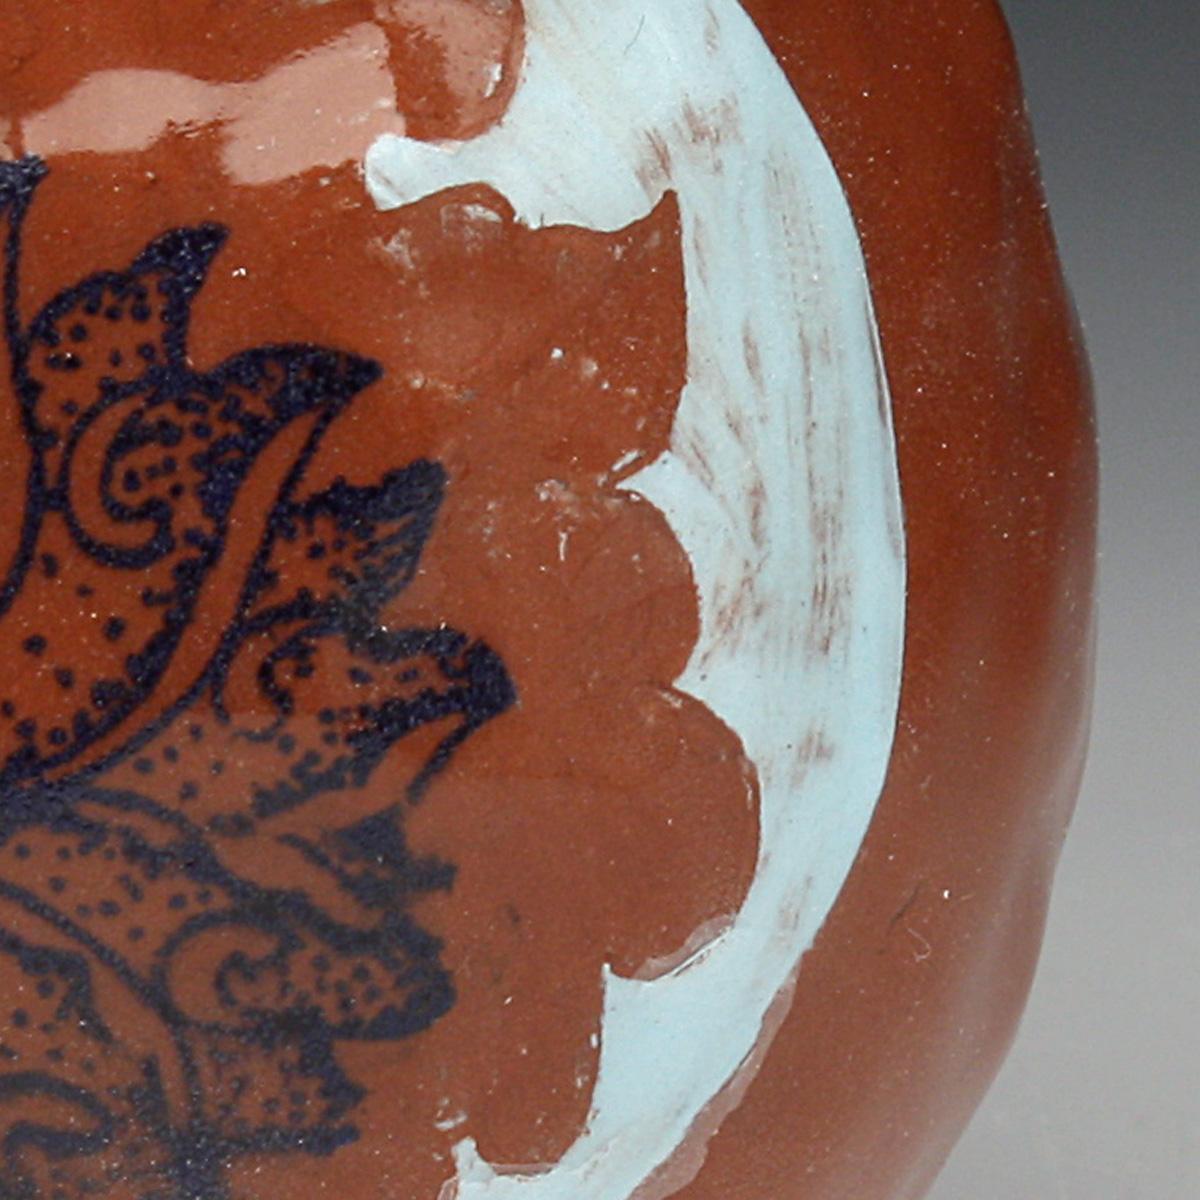 miniture vase detail.JPG